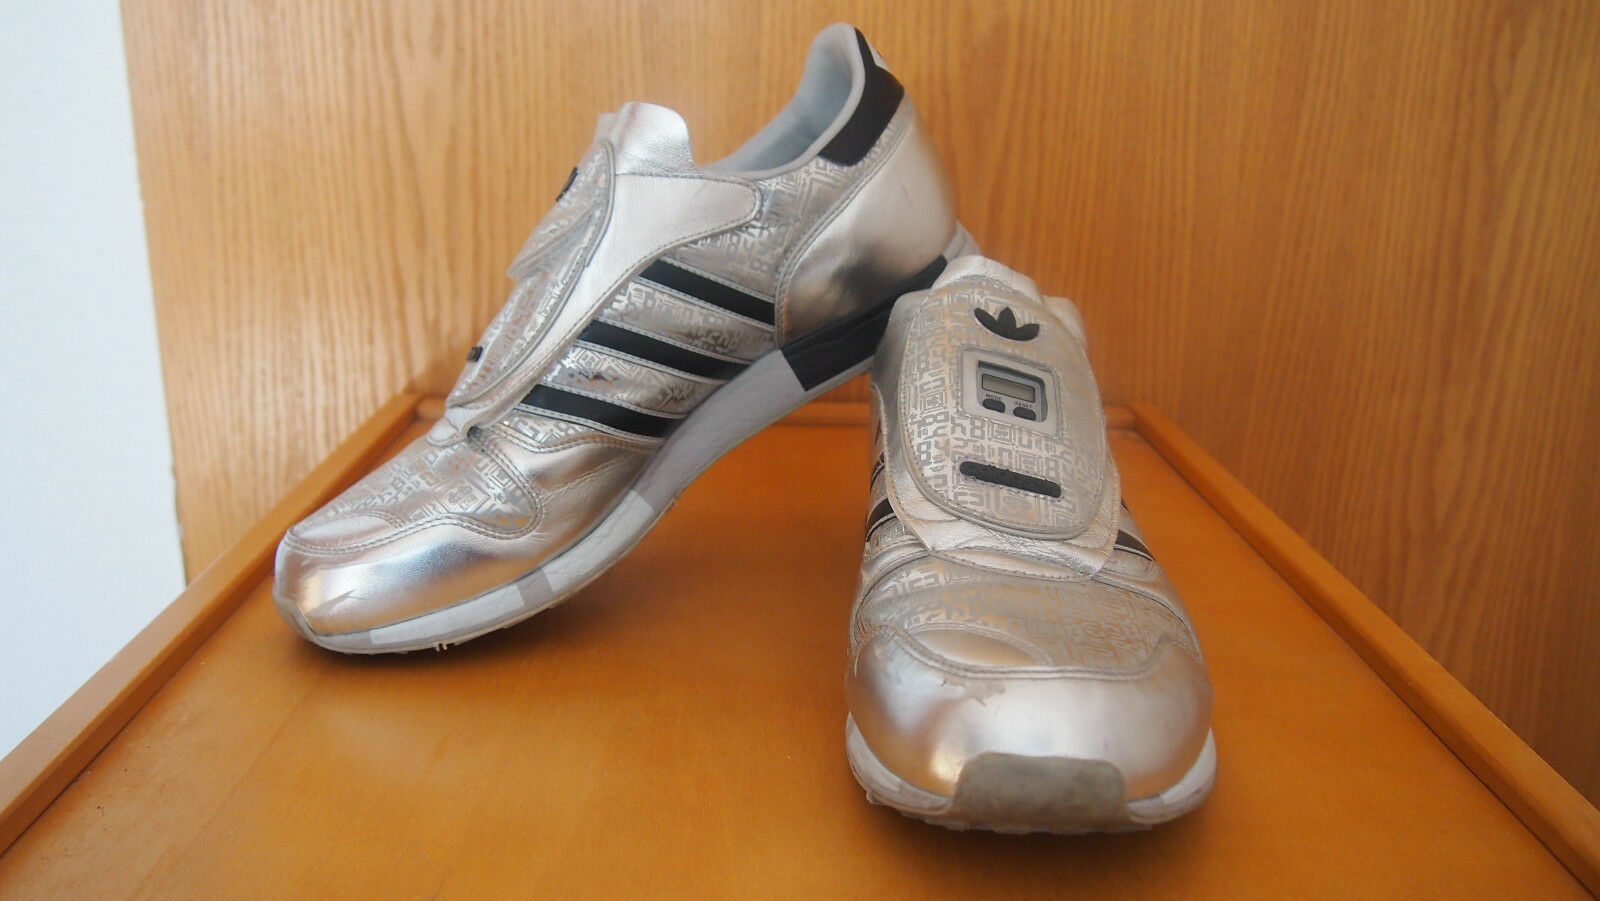 Adidas Micropacer Sneaker Turnschuhe * Silber/Schwarz. Silver/Black US 10. EU 44